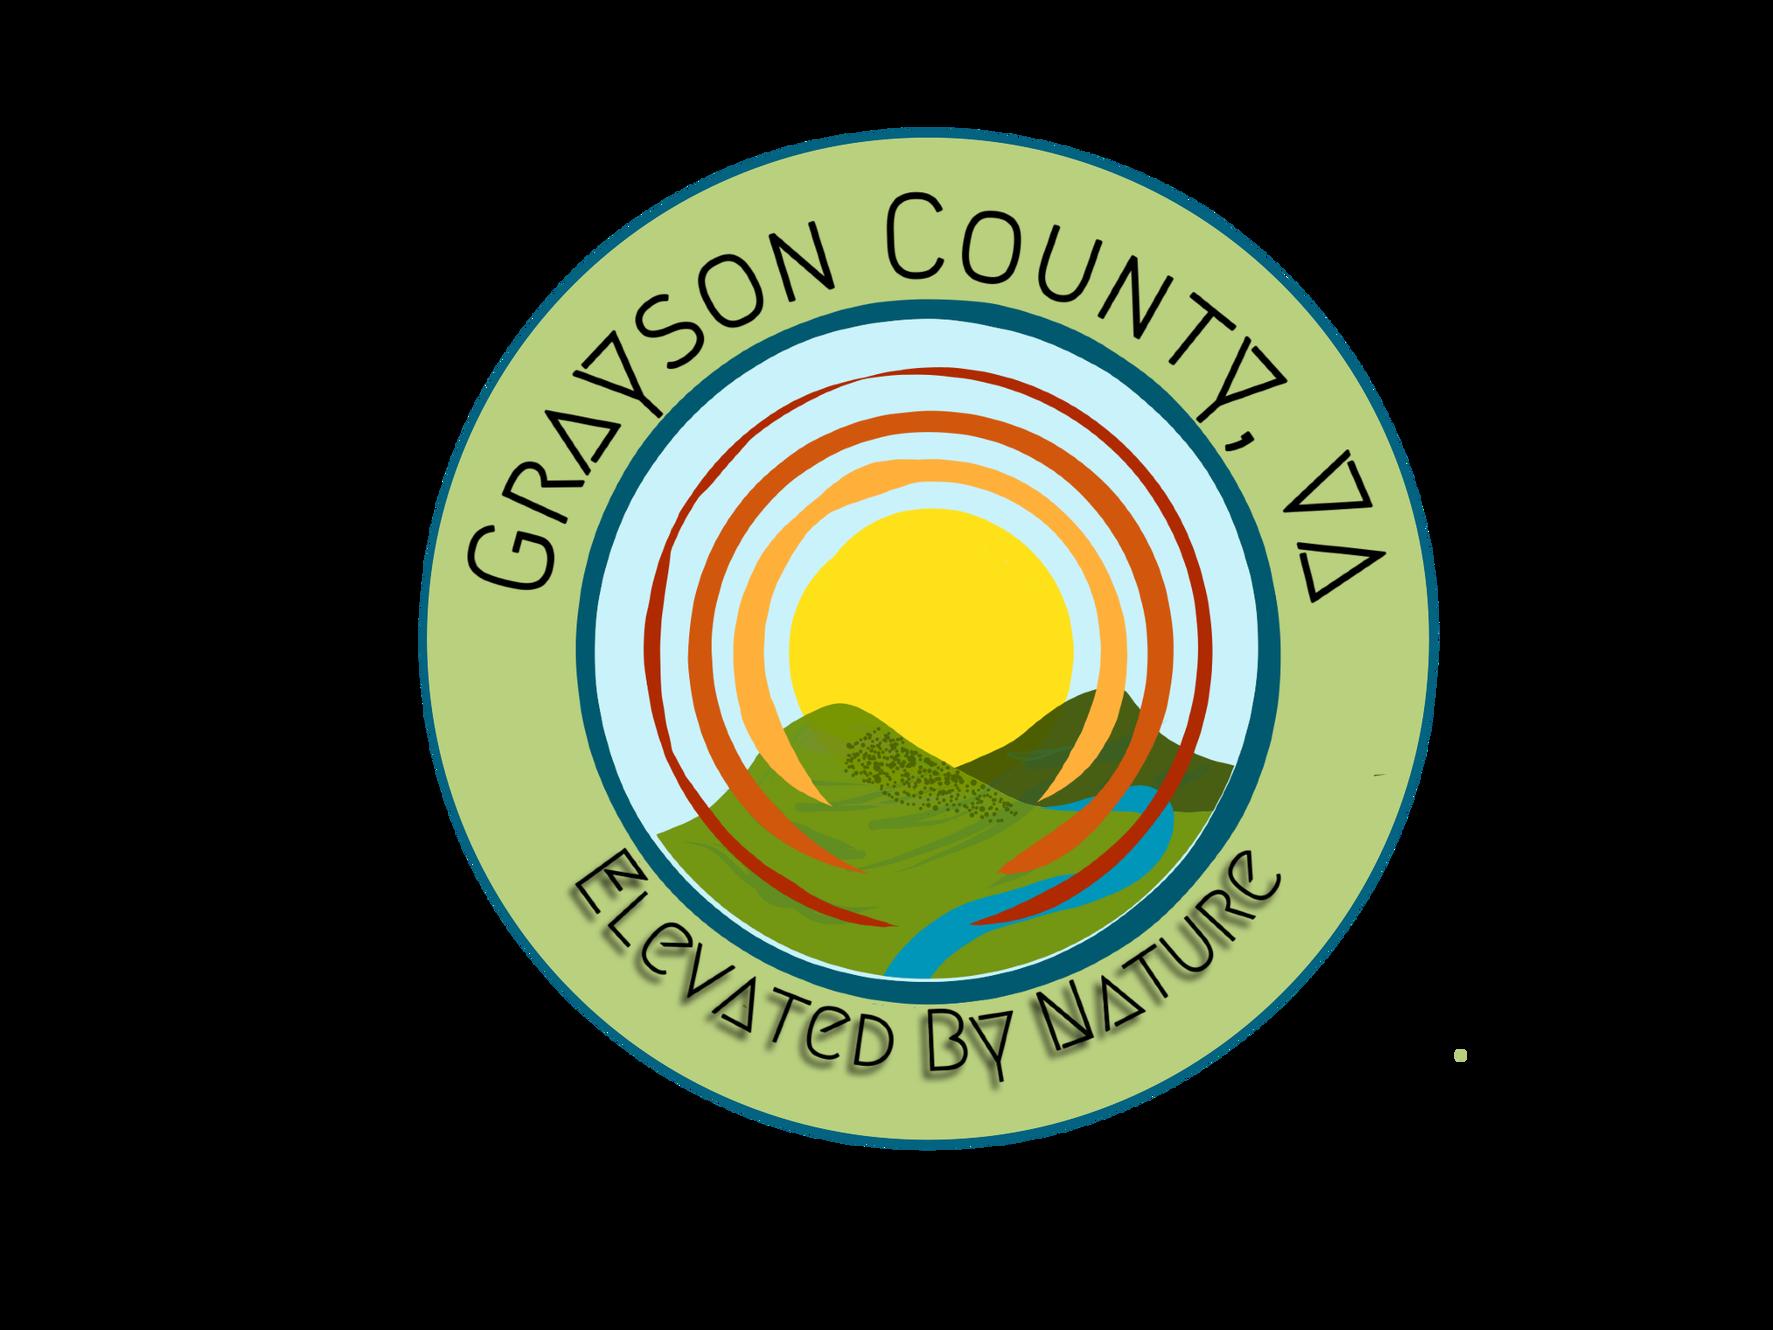 Grayson county juvenile boot camp